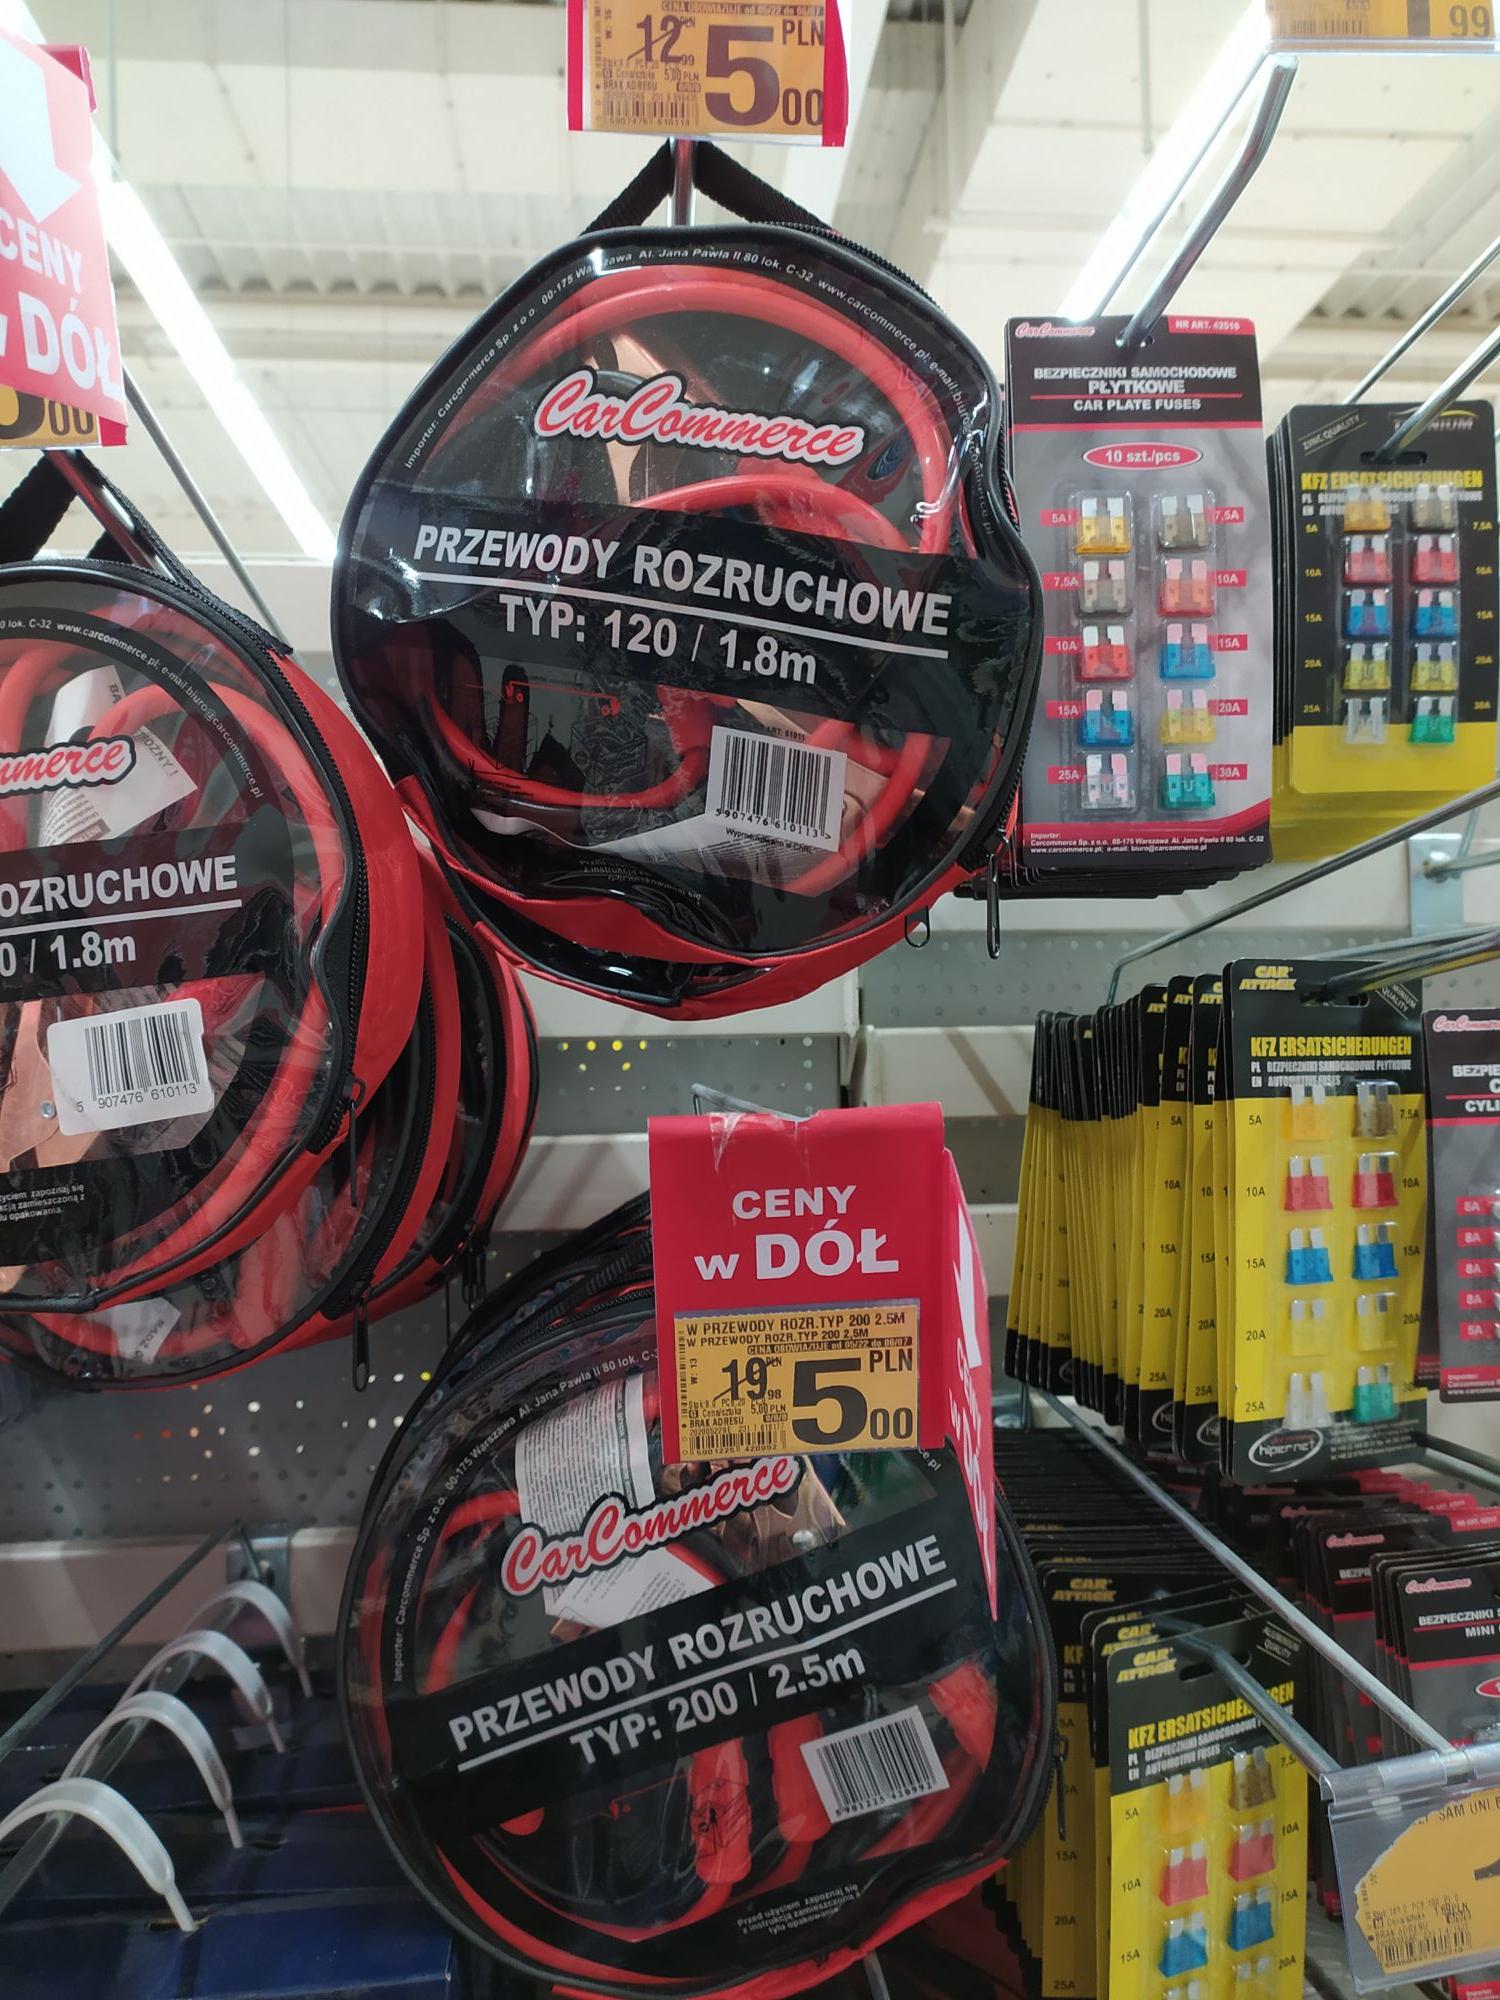 Kable rozruchowe 200 400 600 Auchan Bytom